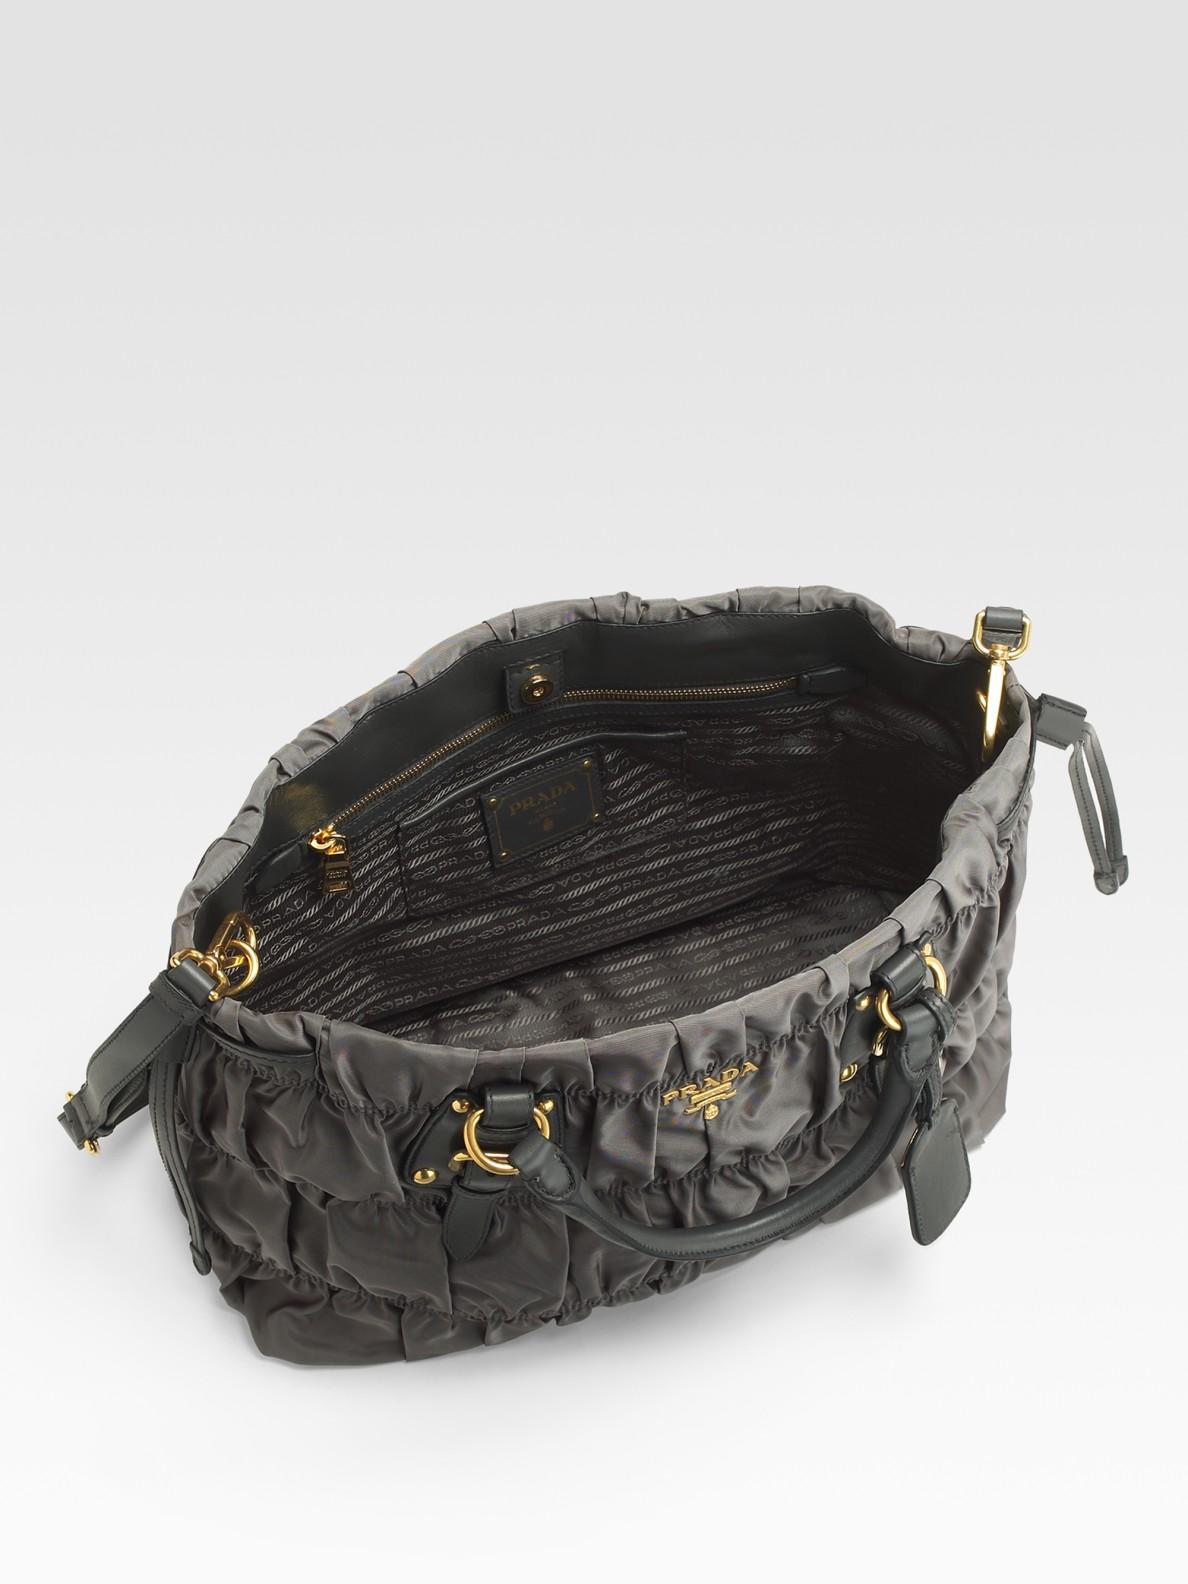 prada bag black leather - prada tessuto gaufre handle bag, knock off prada bag